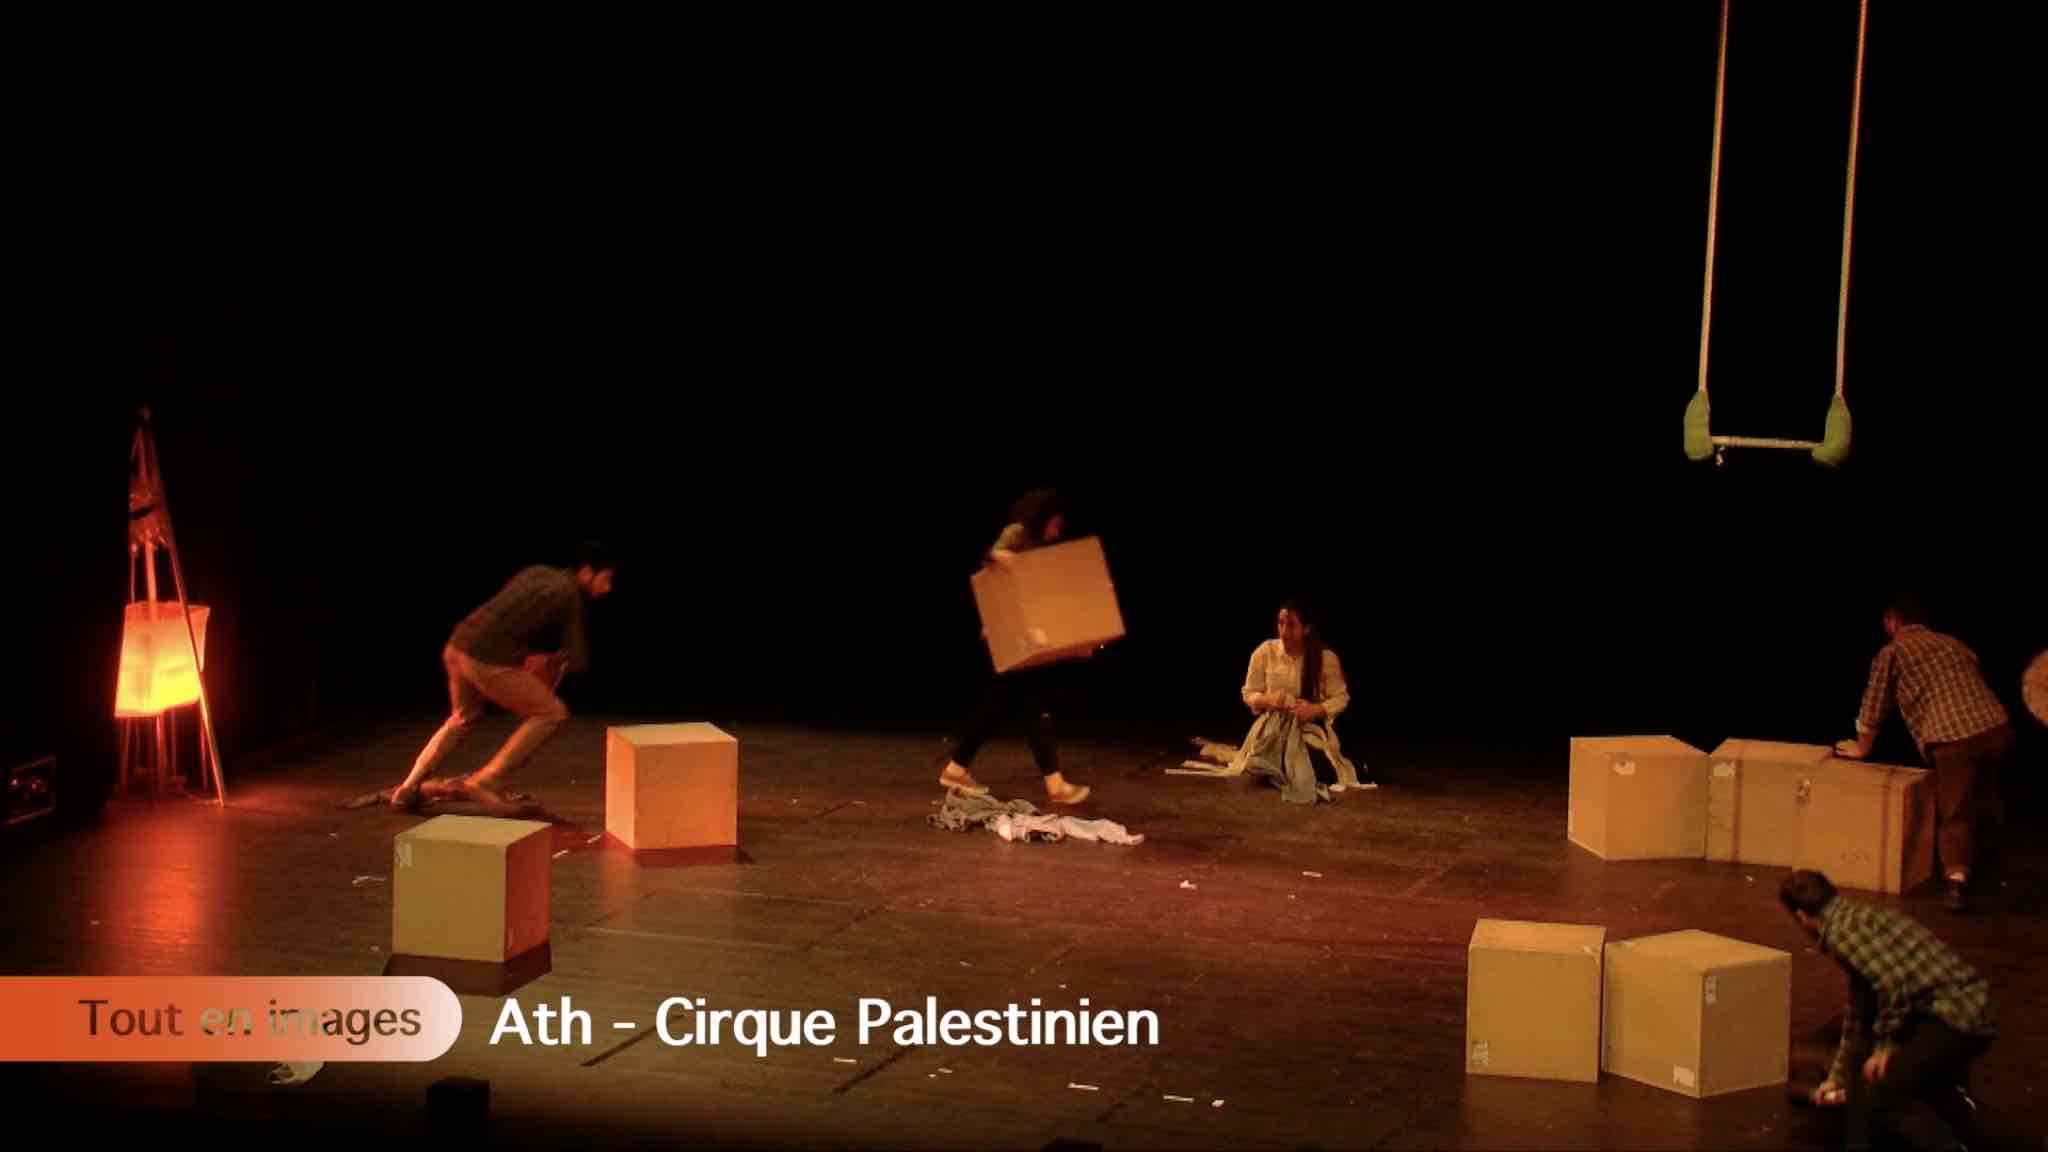 Cirque Palestinien